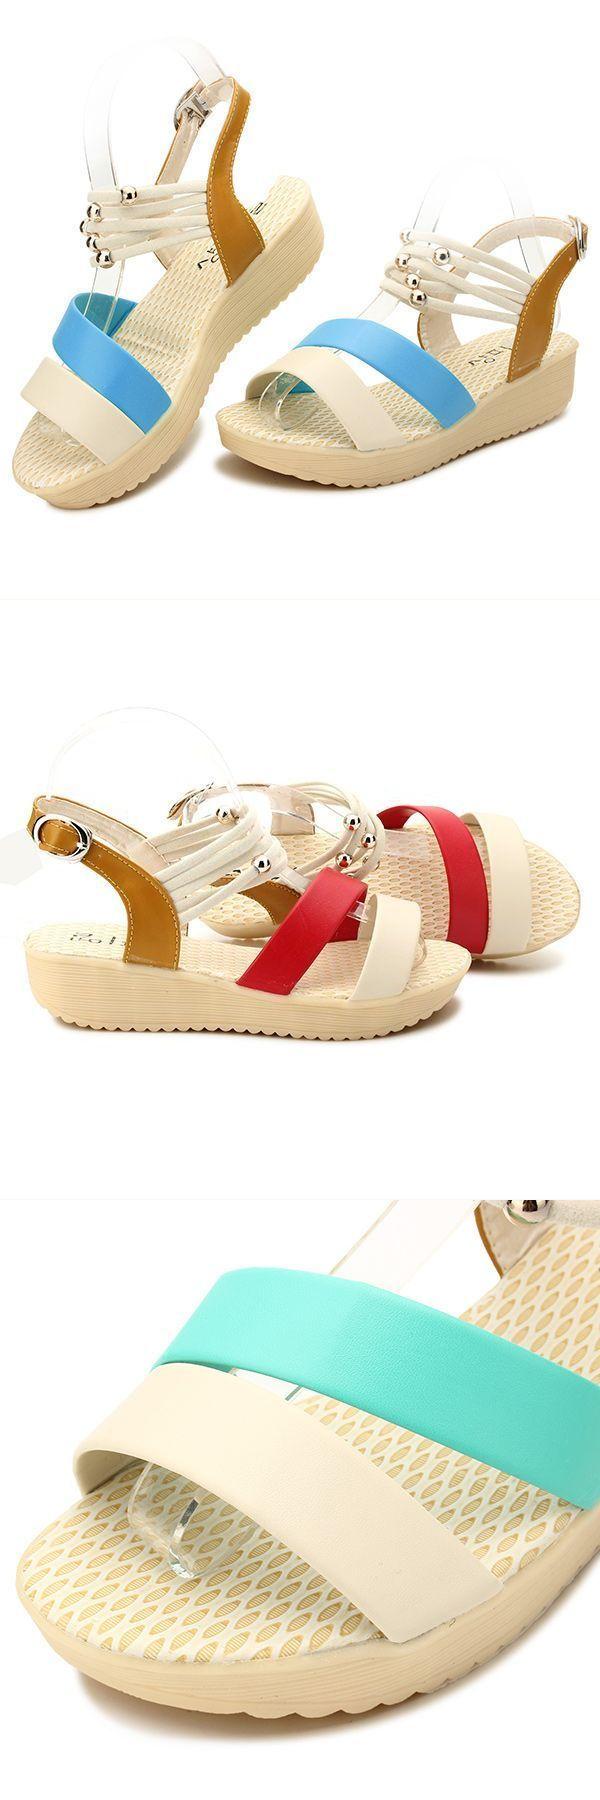 Sandals 800 women summer beach peep toe wedge sandals breathable strap platform sandals #sandals #65 #off #sandals #n #shoes #sandals #quiksilver #t #shaped #sandals